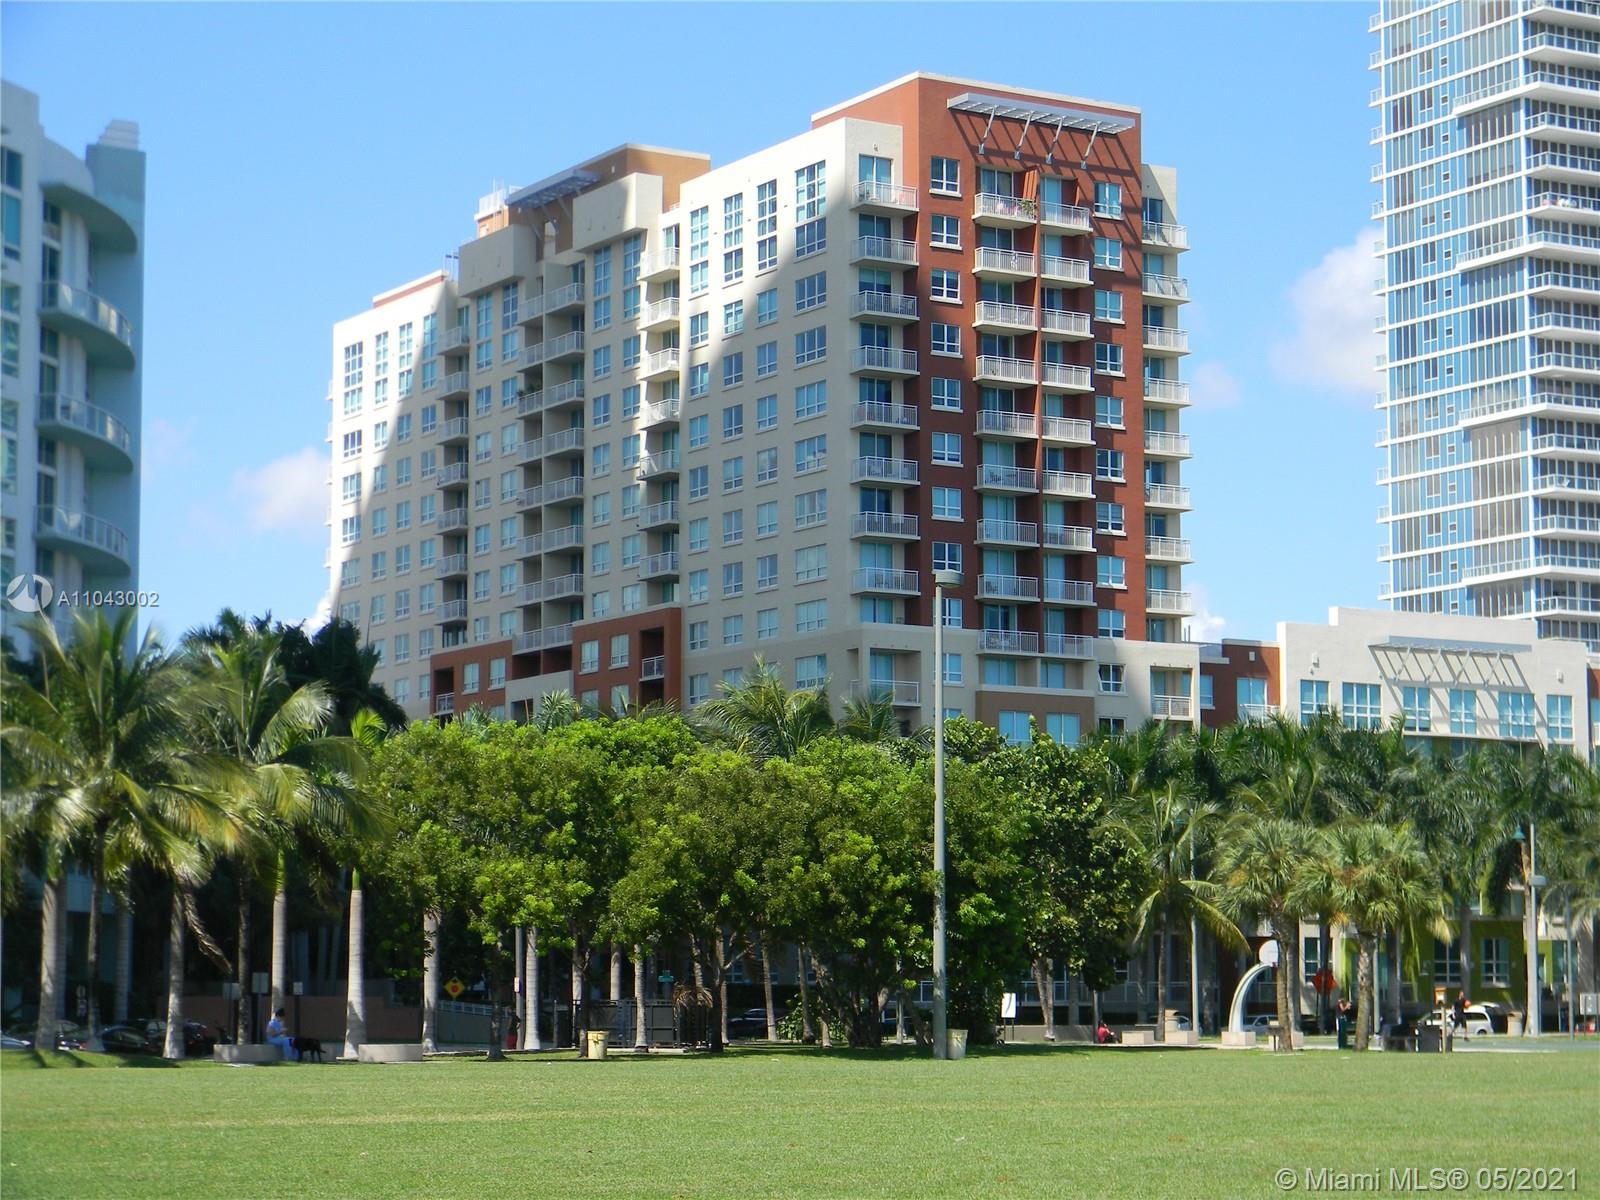 Cite East #411 - 2000 N Bayshore Dr #411, Miami, FL 33137